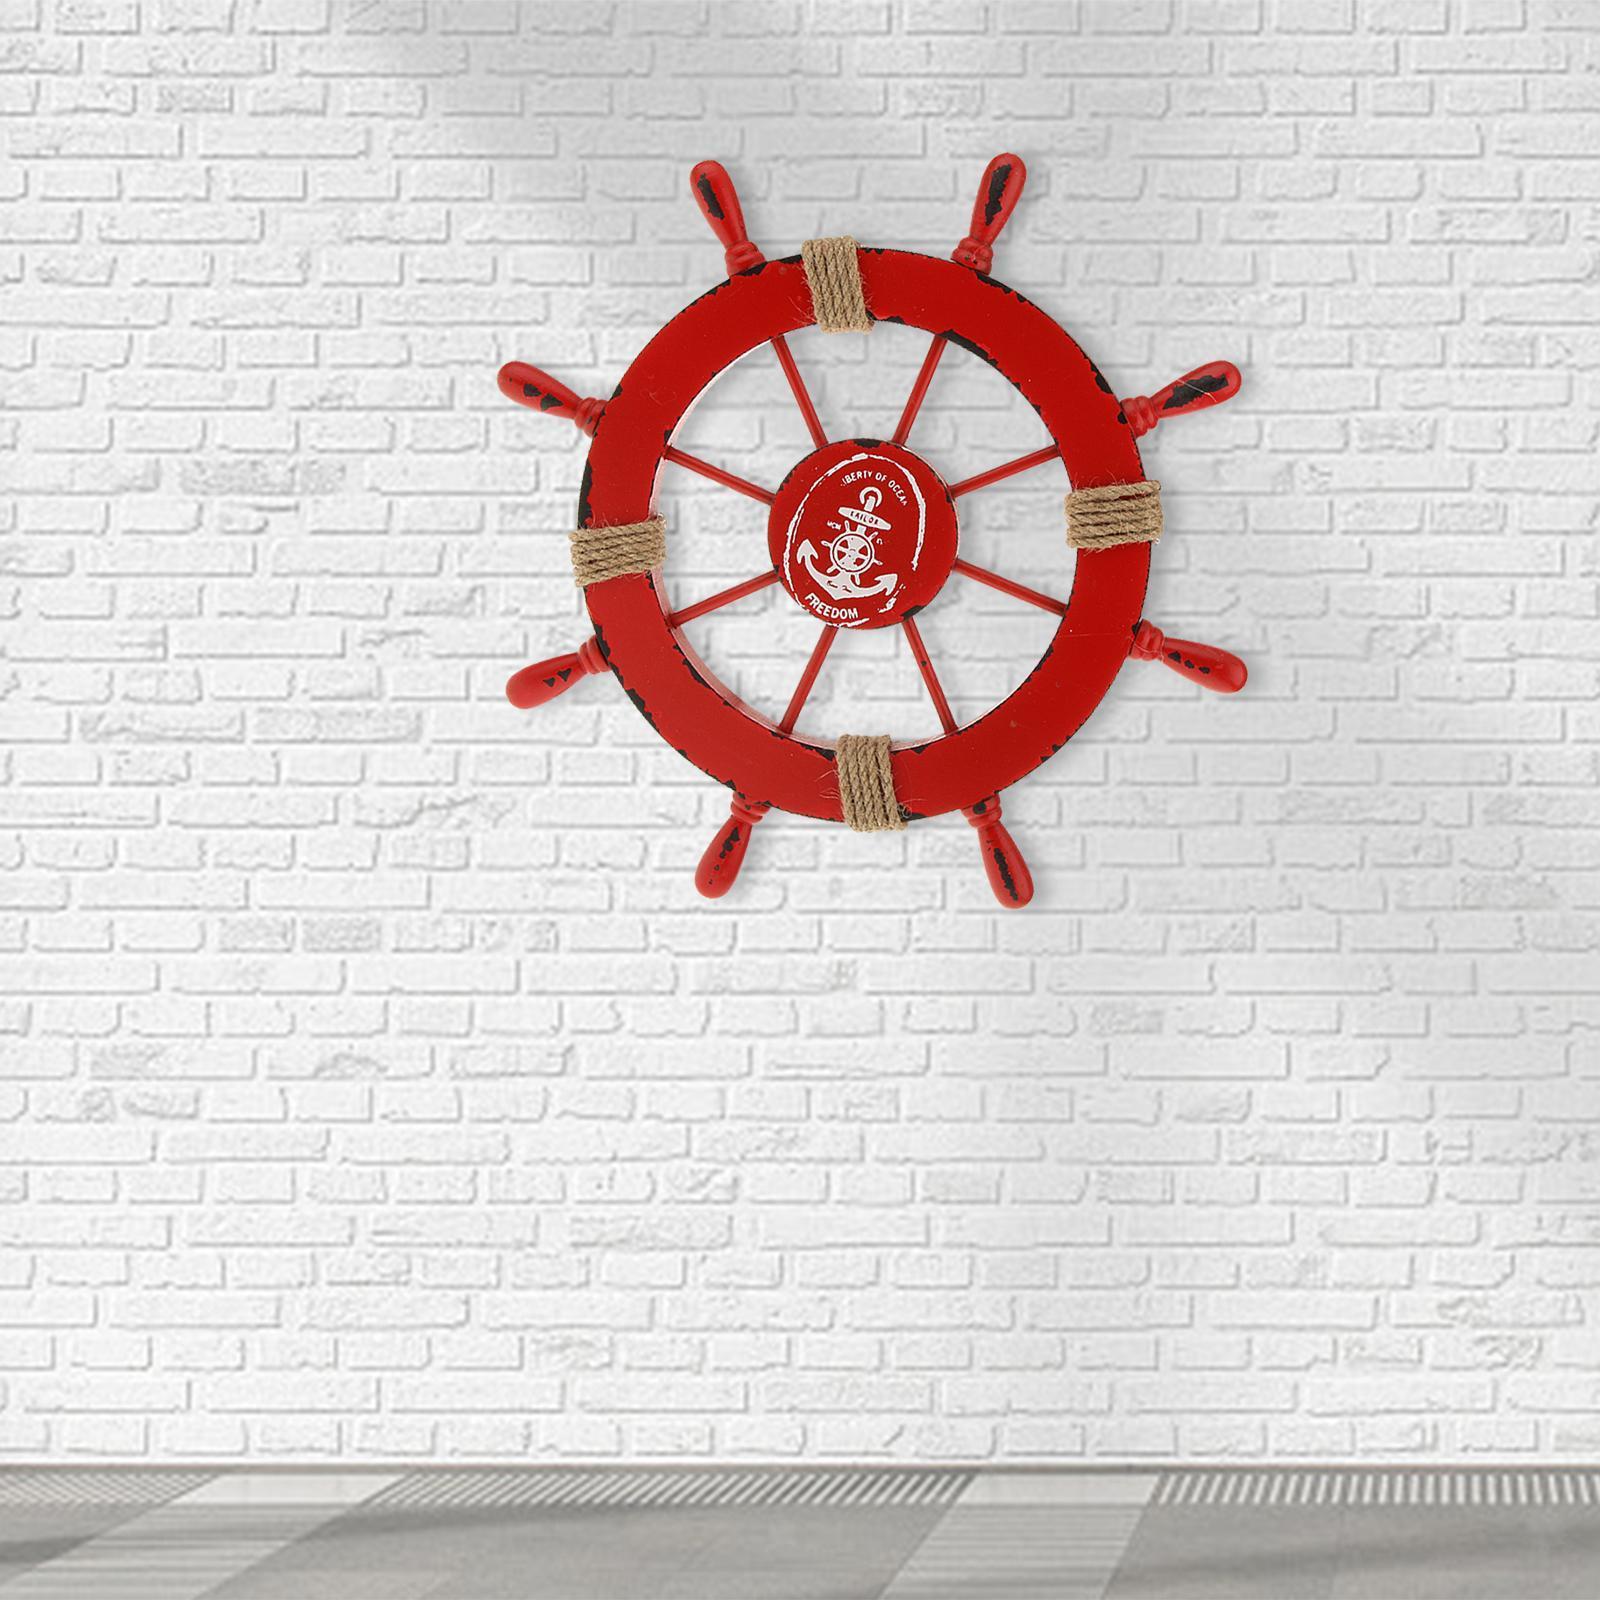 Nautical-Beach-Wooden-Boat-Ship-Wheel-Home-Bar-Wall-Party-Hanging-Decoration thumbnail 16